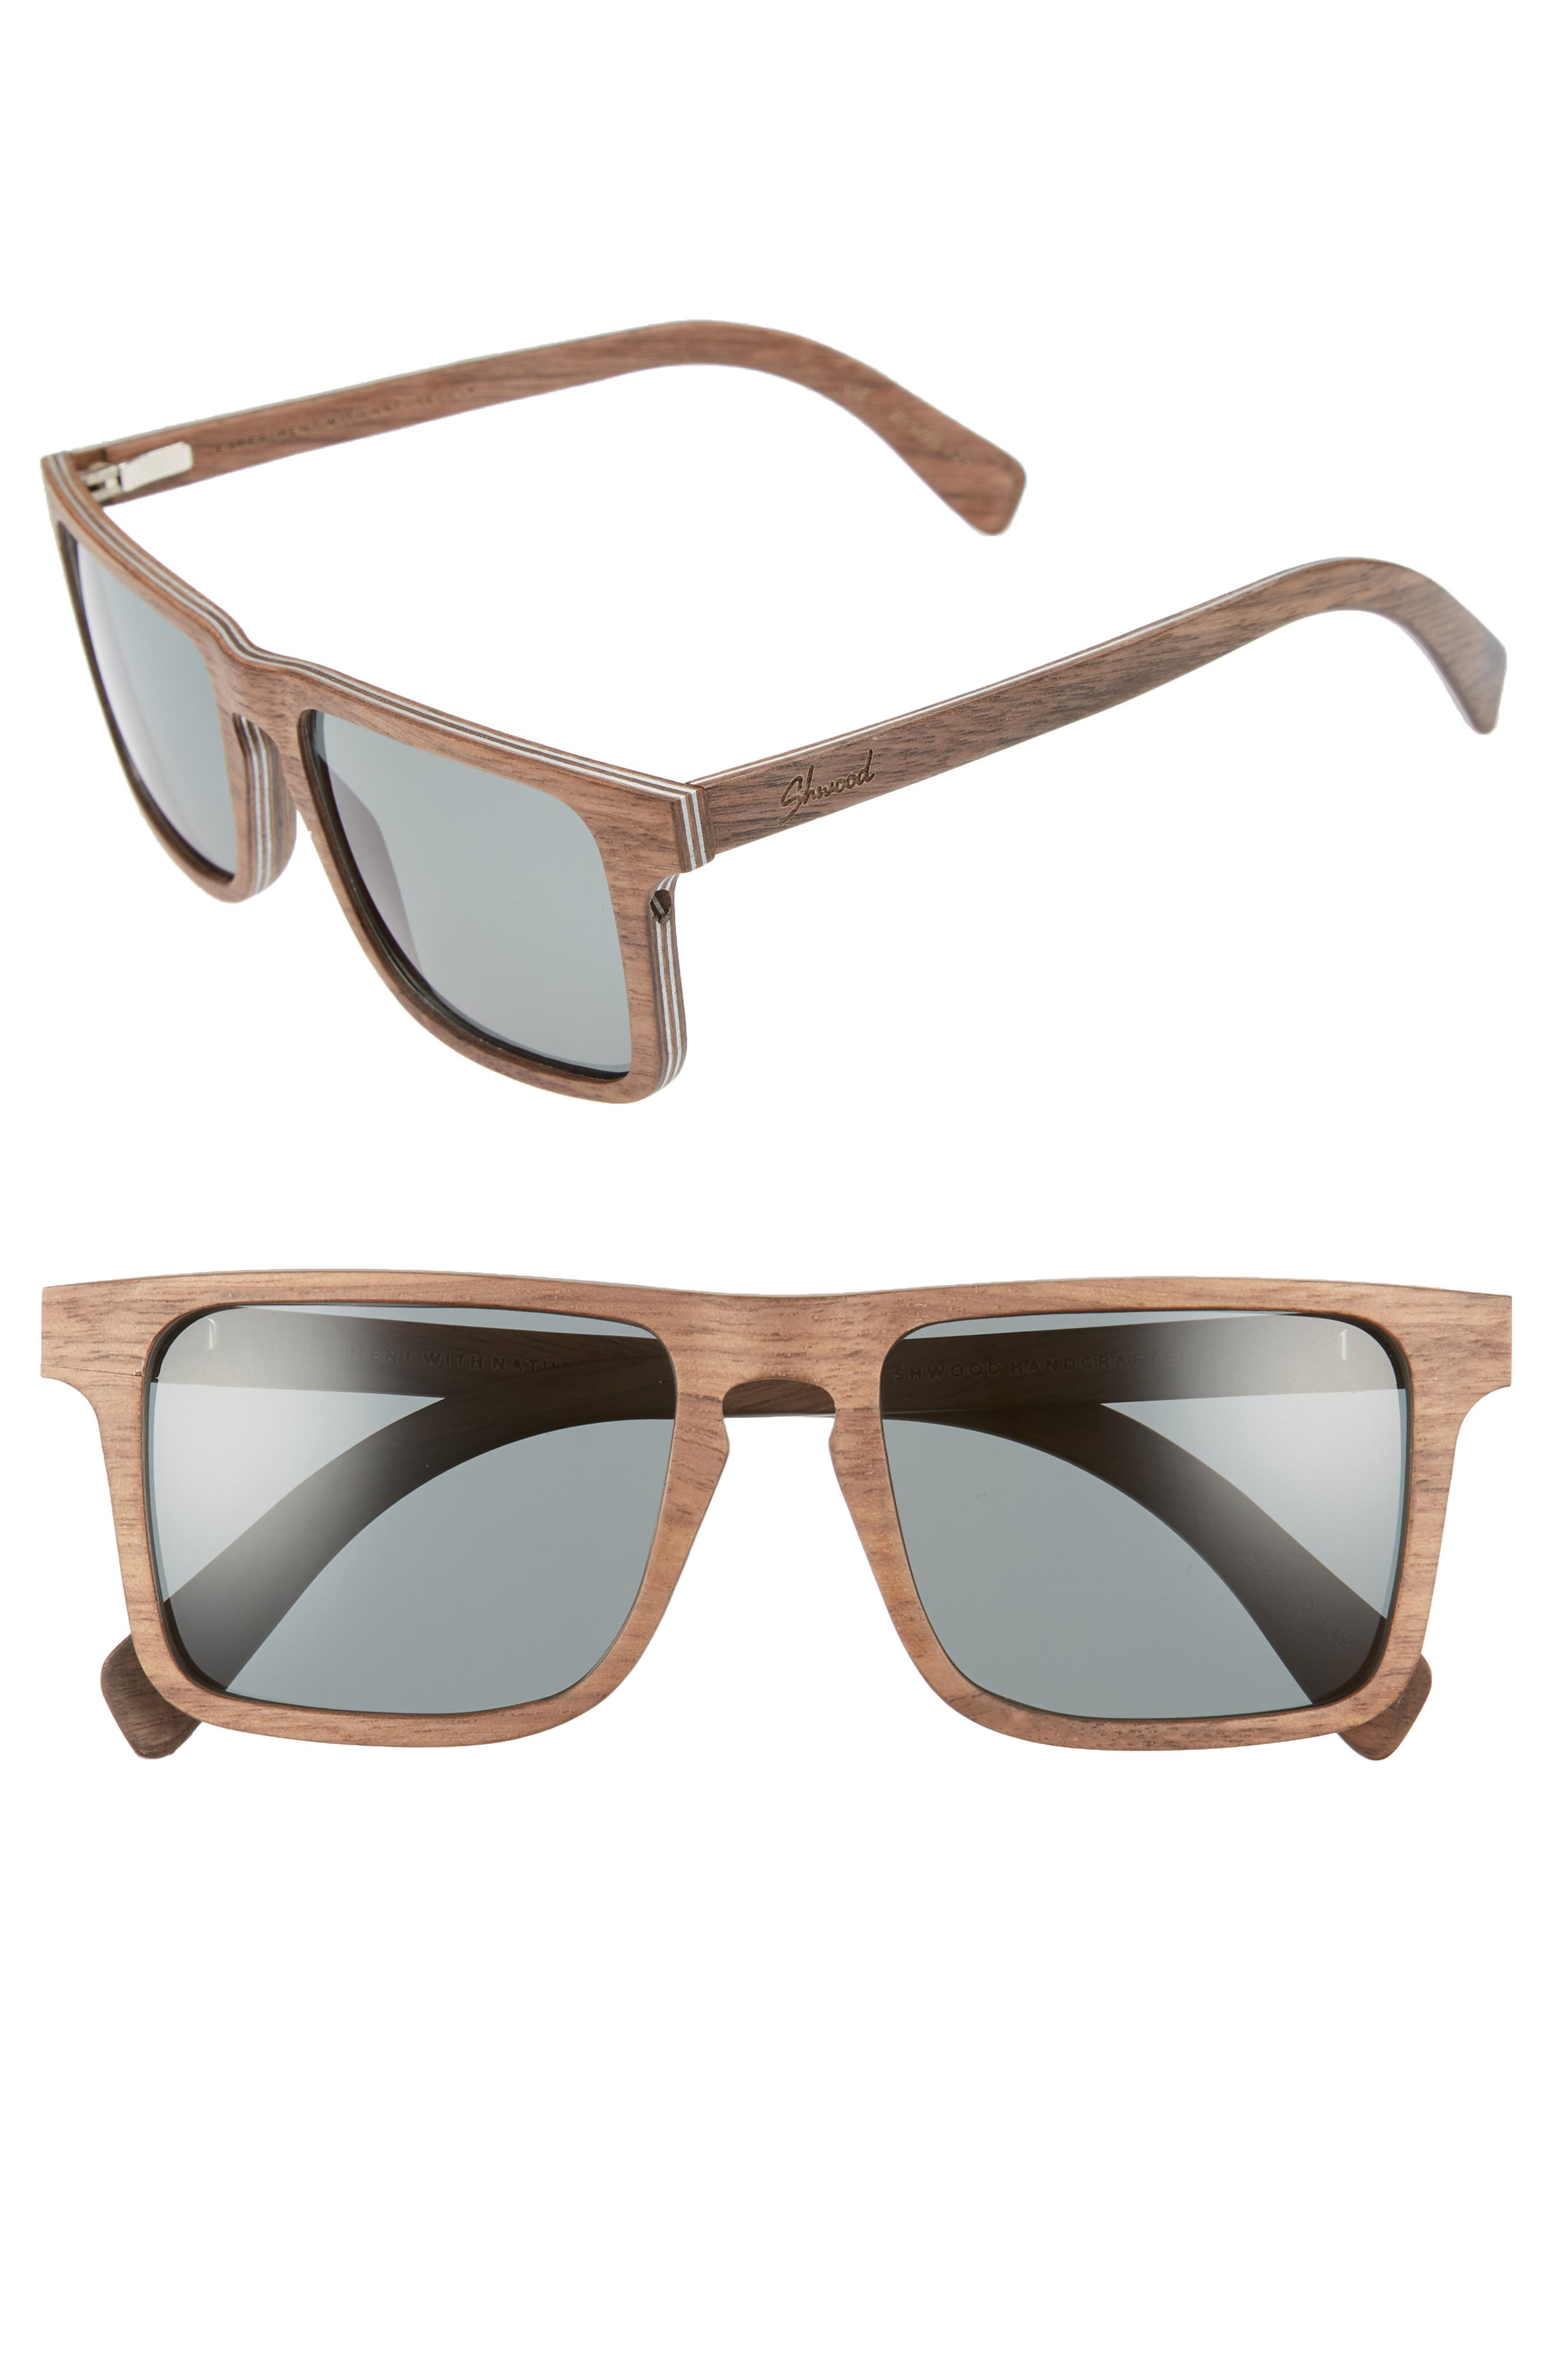 Govy 2 52mm Polarized Wood Sunglasses,                             Main thumbnail 1, color,                             Walnut/ Grey